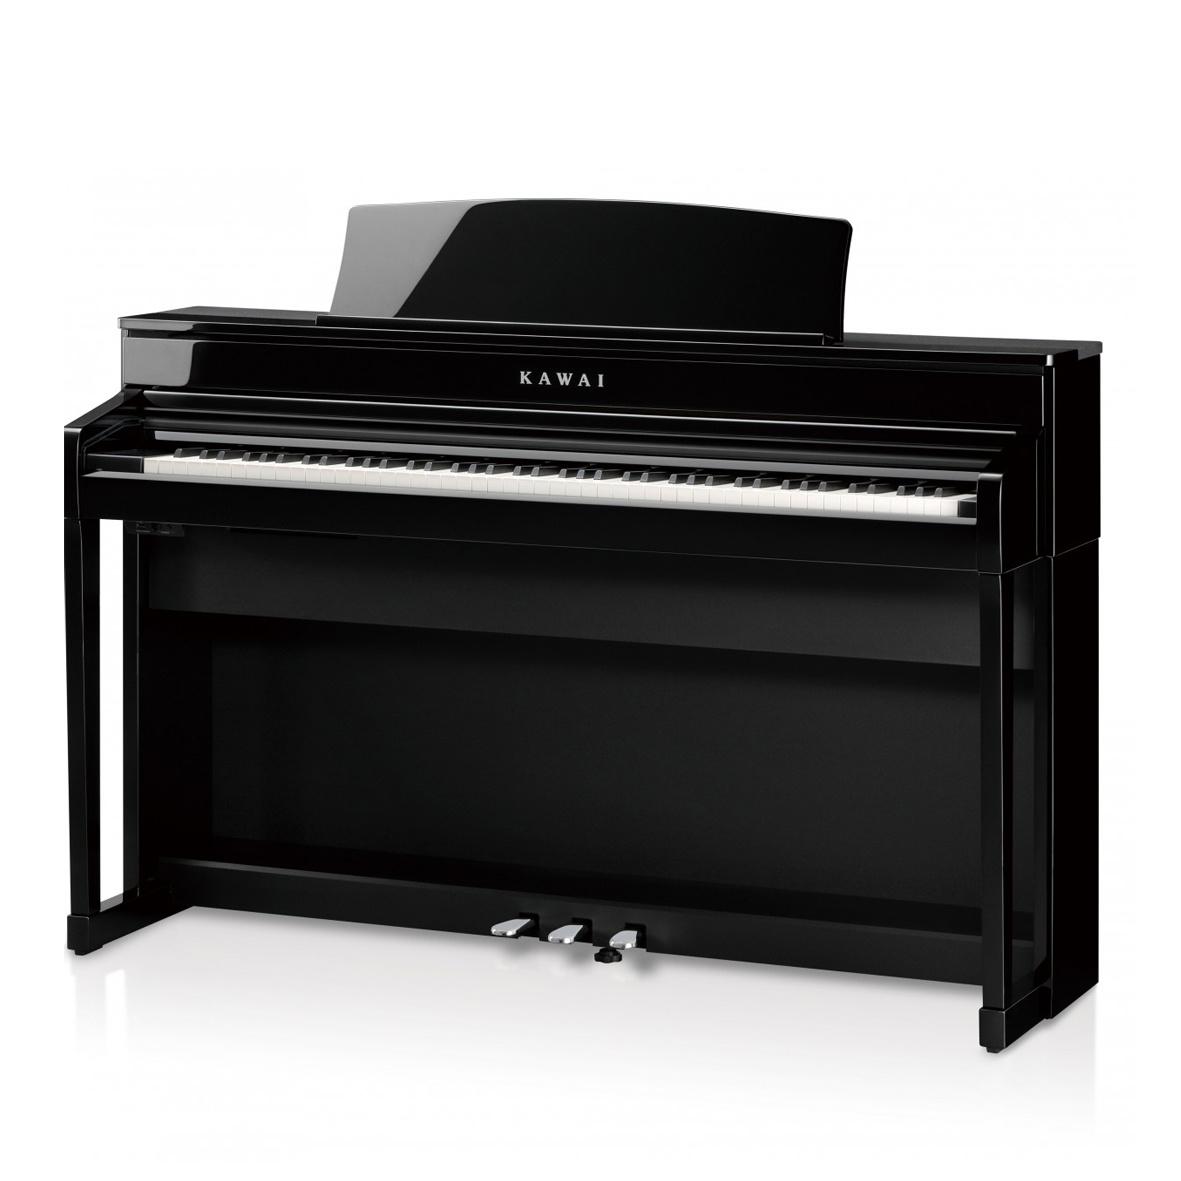 Kawai - Digital und E Piano Kawai CA 79 PE